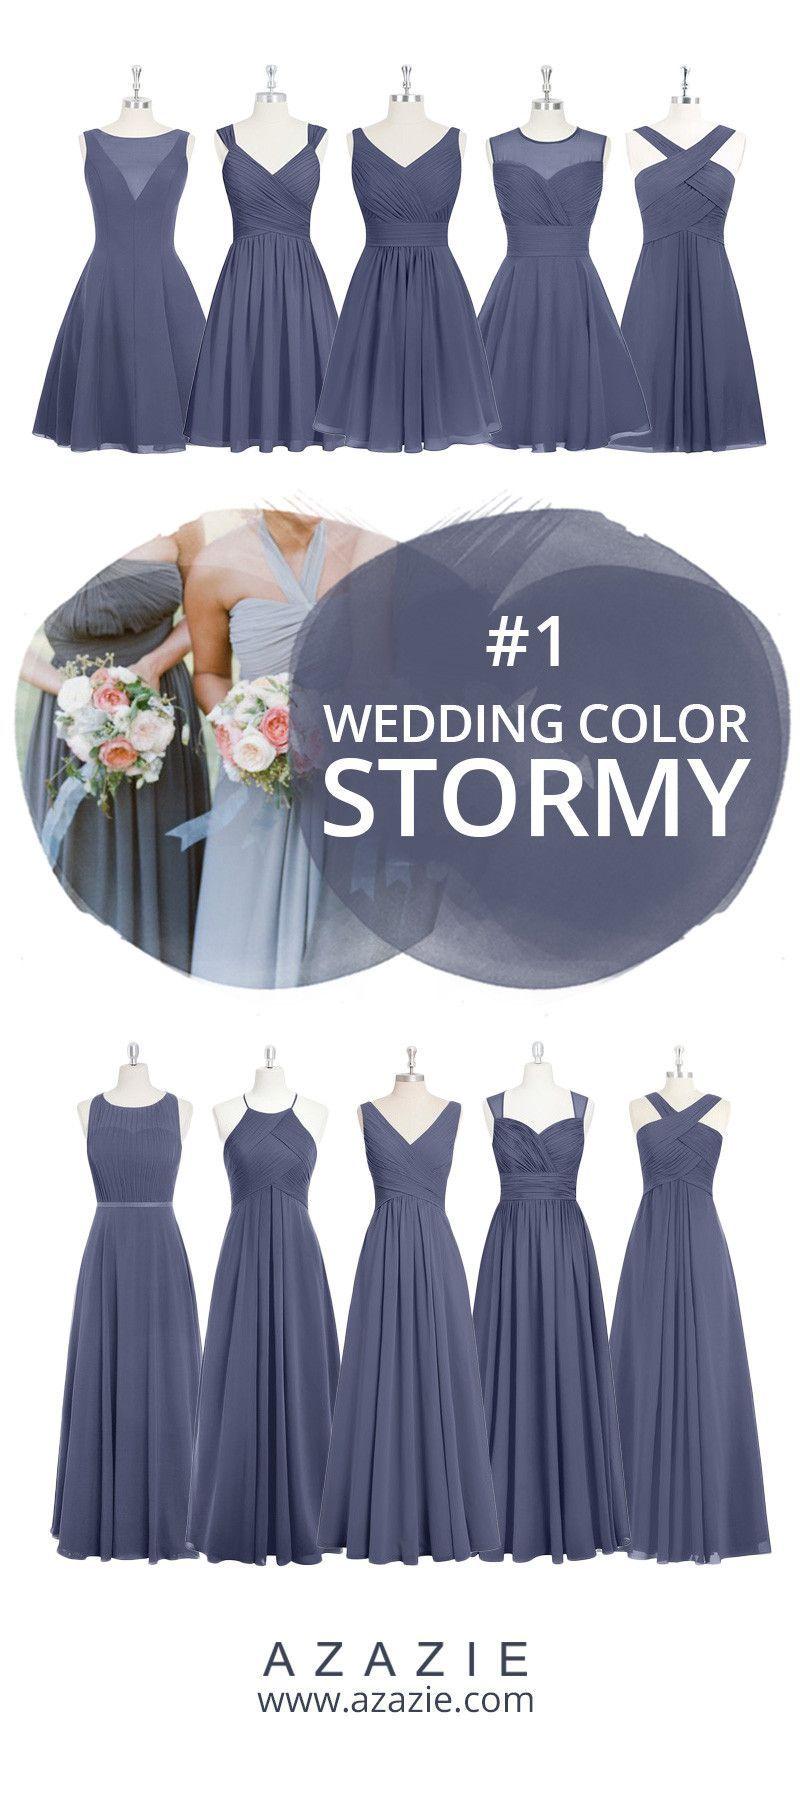 Azazie stormy swatch in fabrics blue chiffon mesh lace tulle